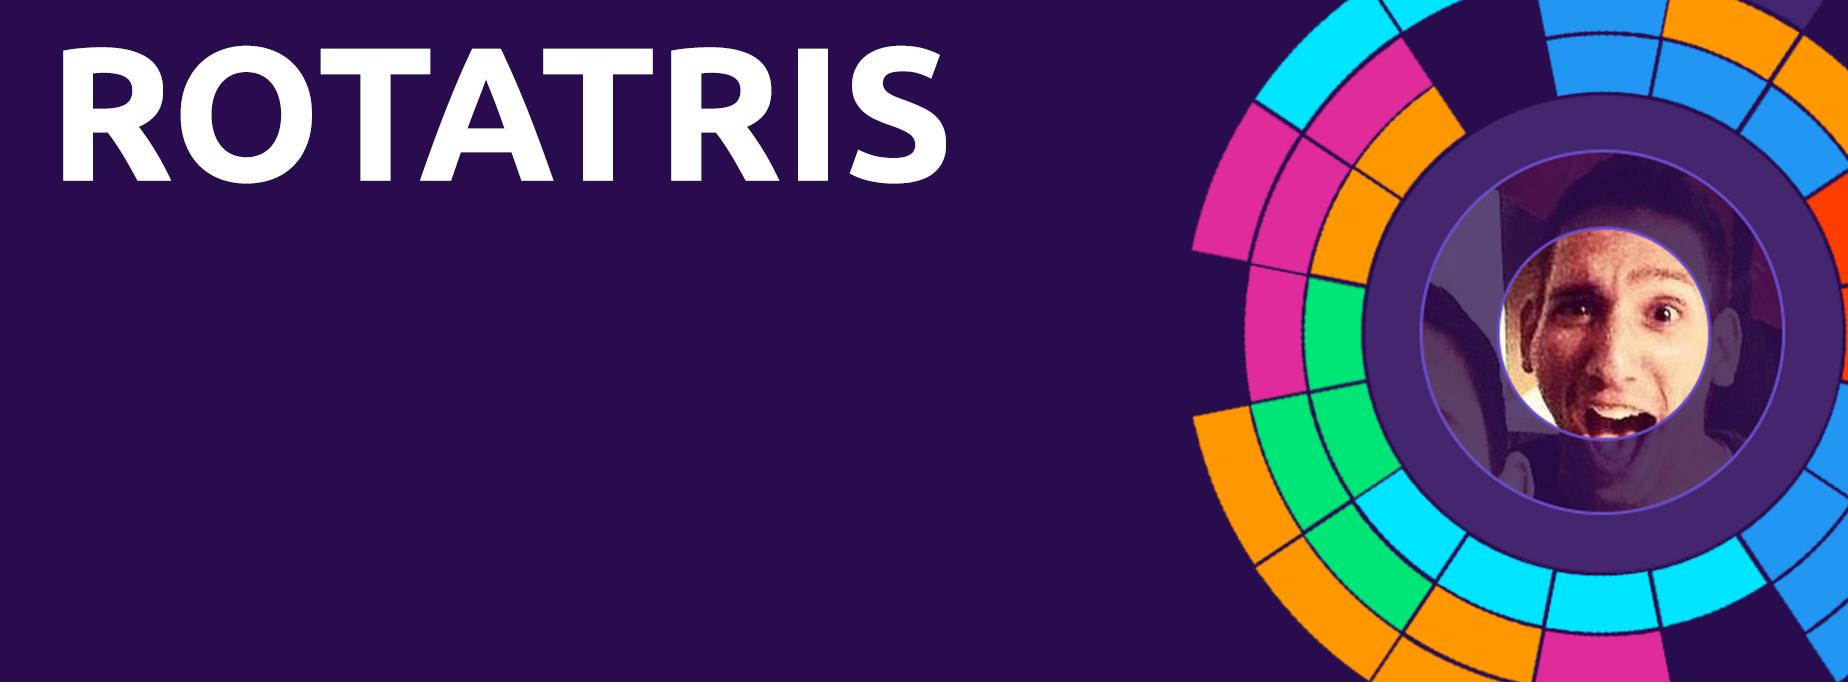 Rotatris